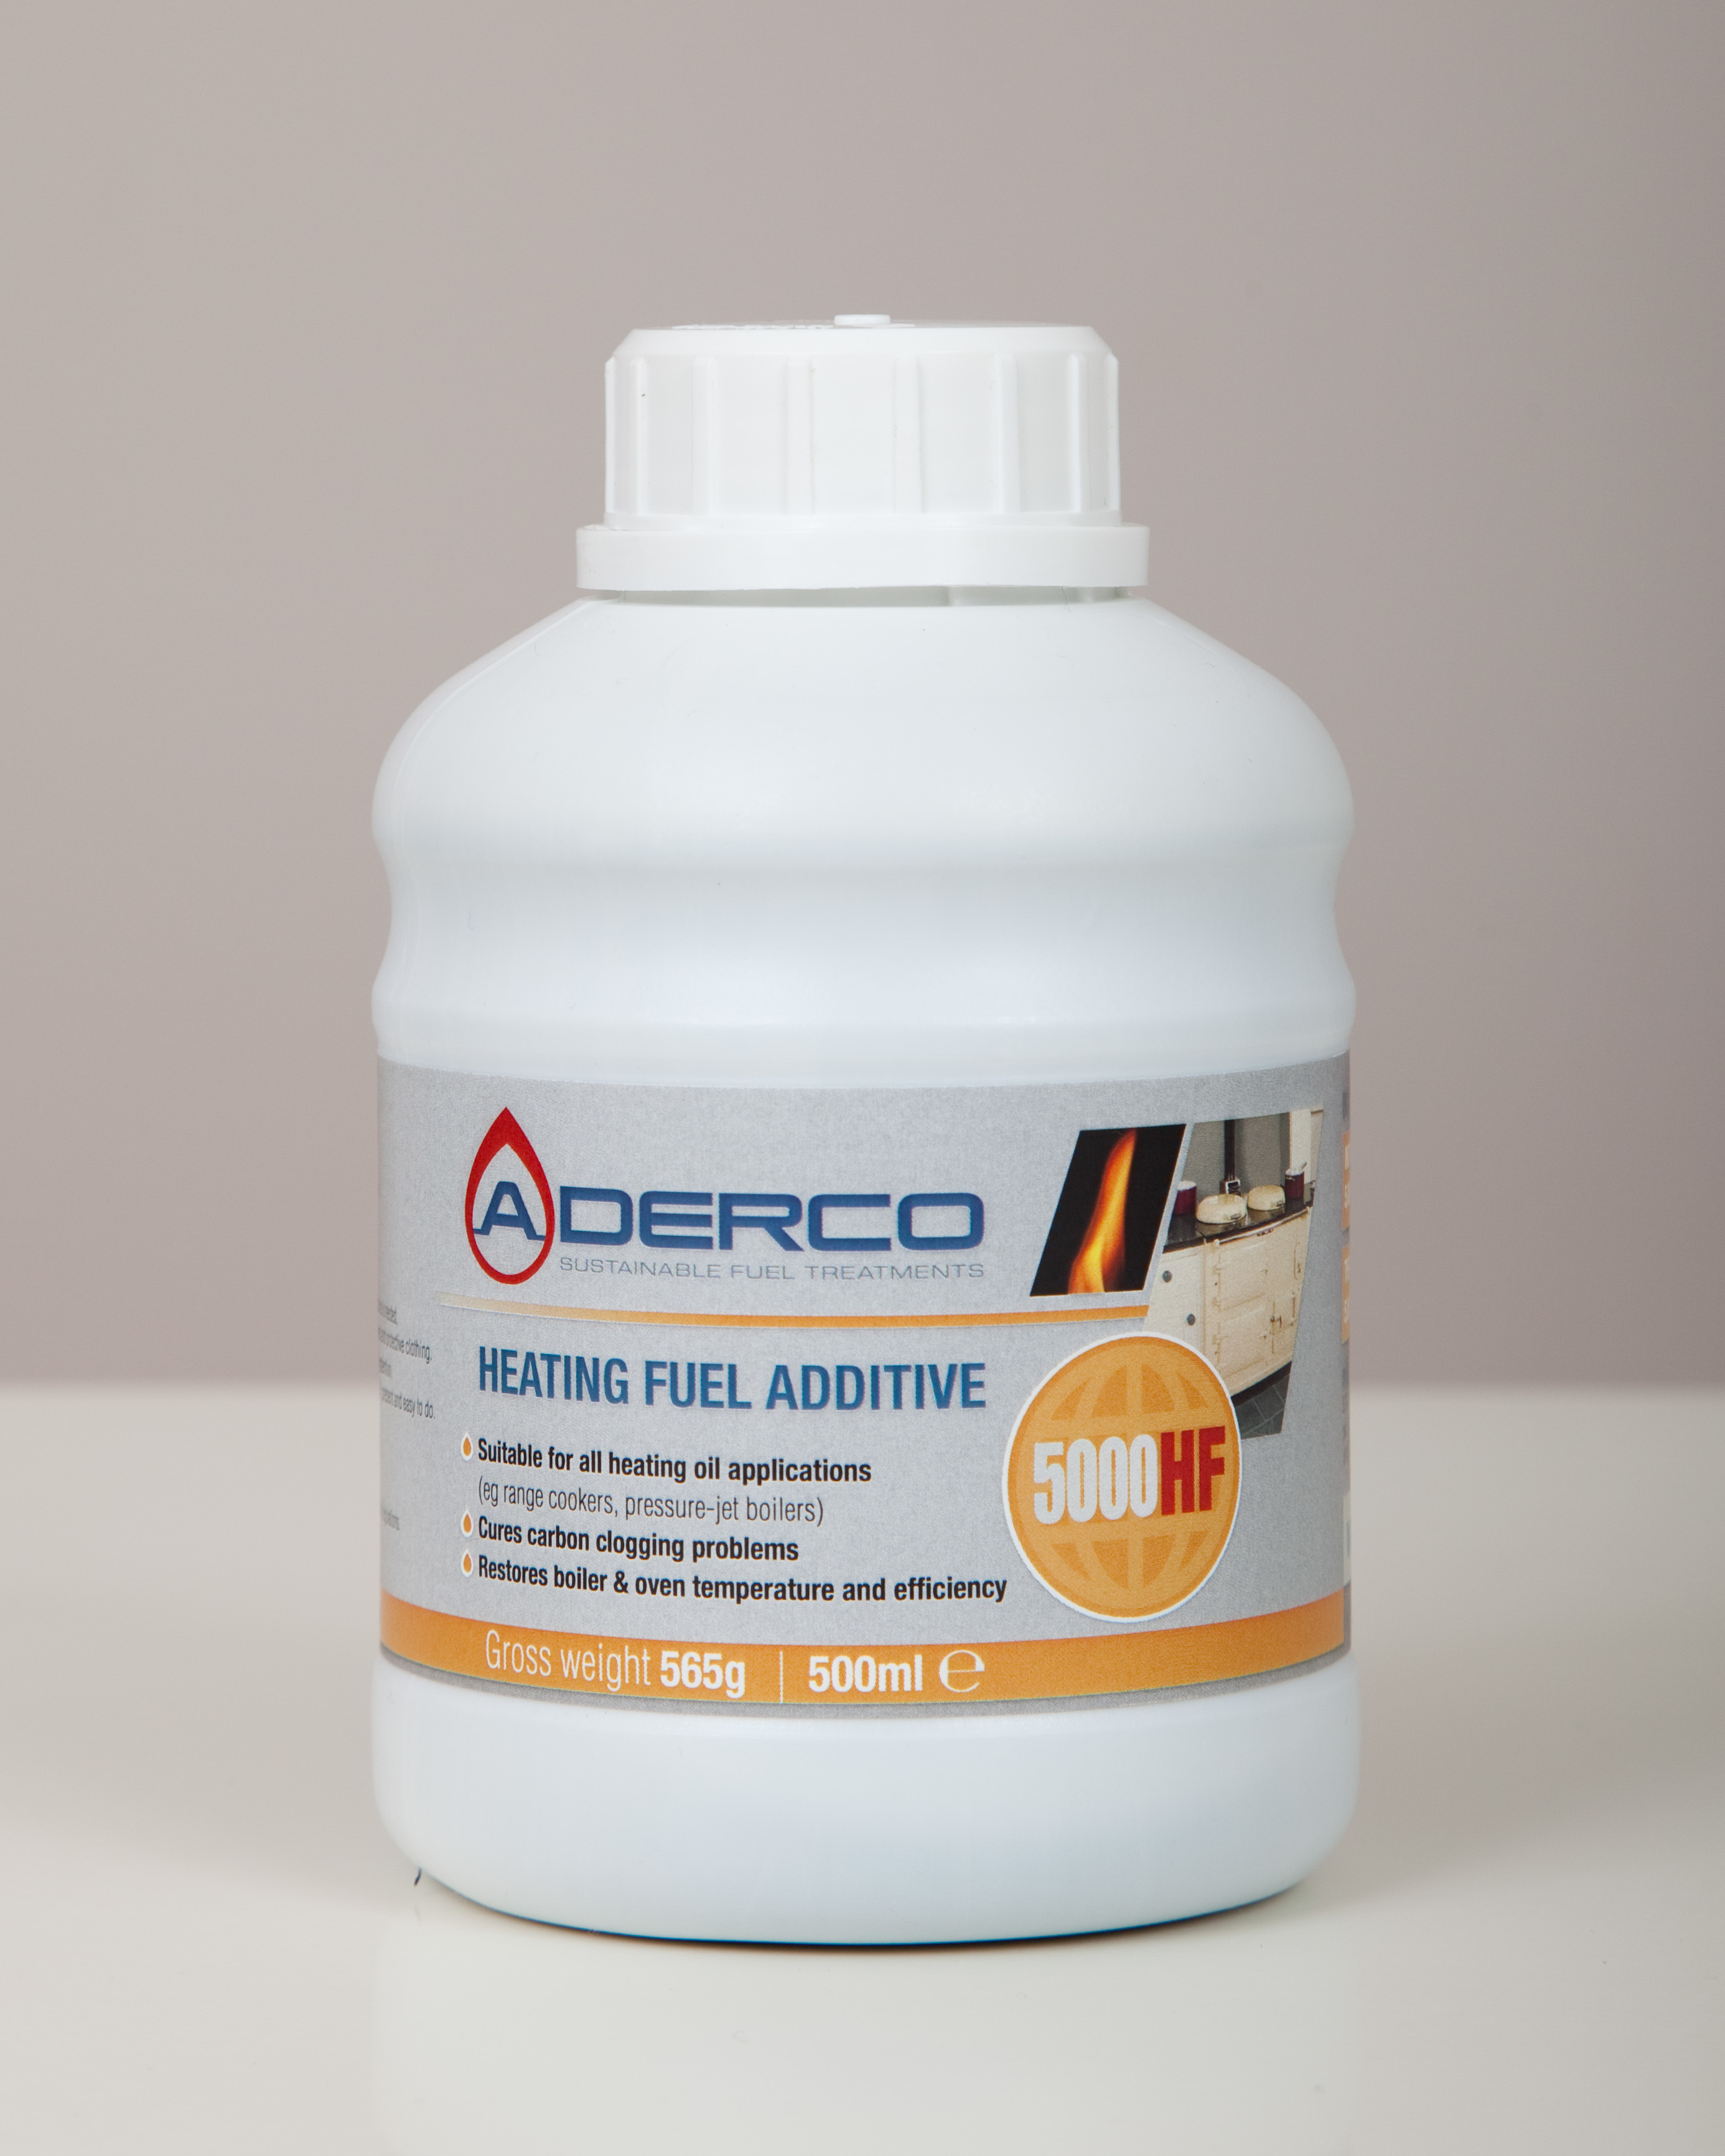 ADERCO 5000 500ml bottle (vehicle dosing kit - includes dosing syringes) AD5000-05kit